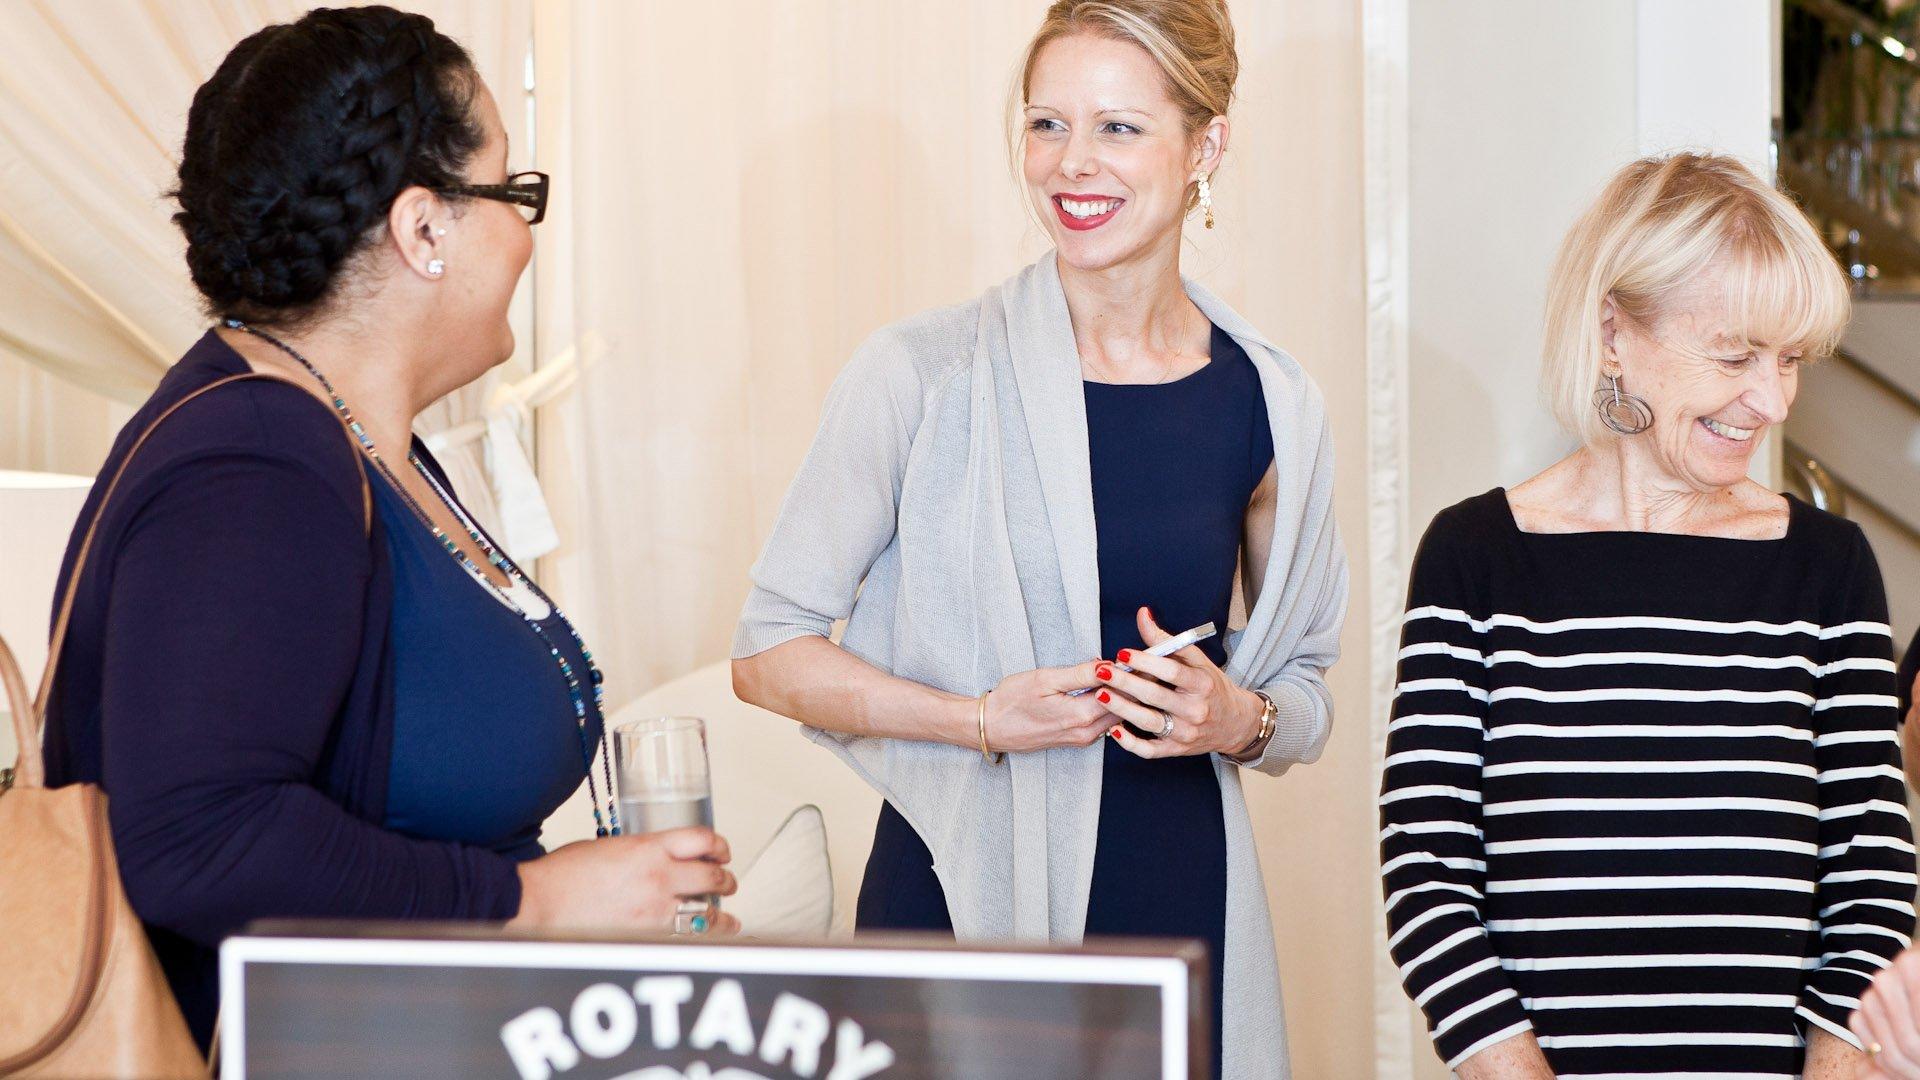 retail-event-photographer